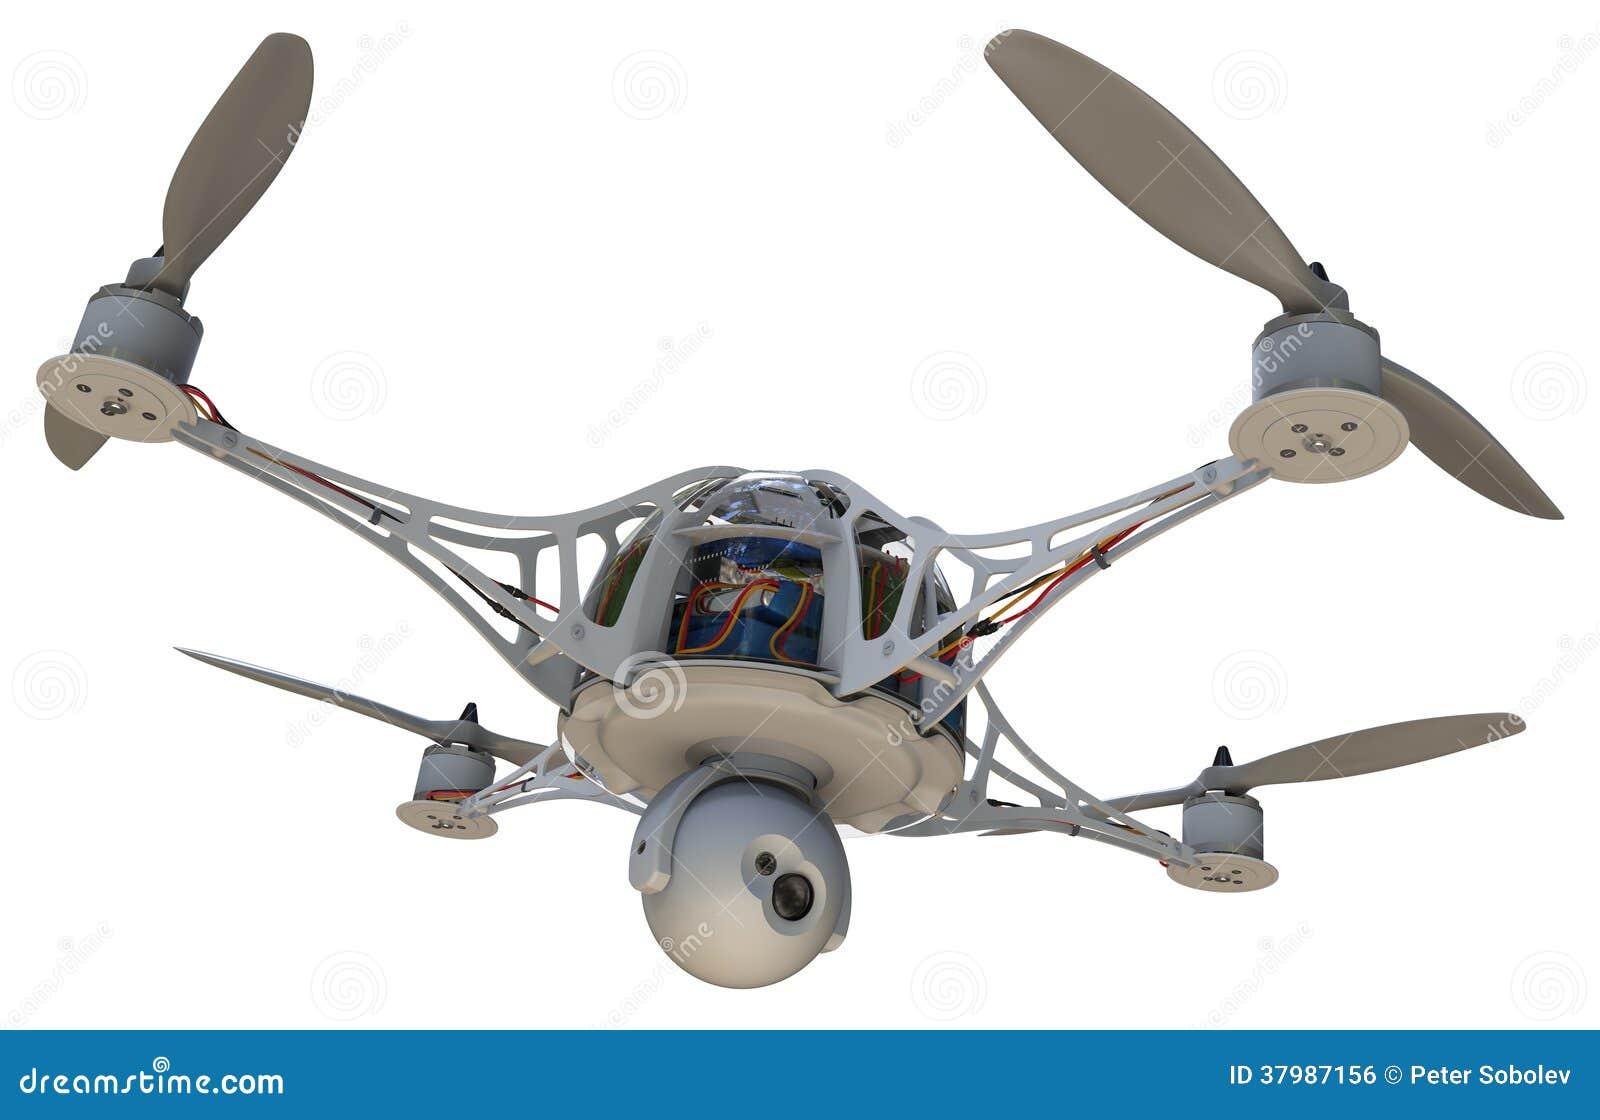 quadrocopter mit kamera lizenzfreies stockbild bild. Black Bedroom Furniture Sets. Home Design Ideas